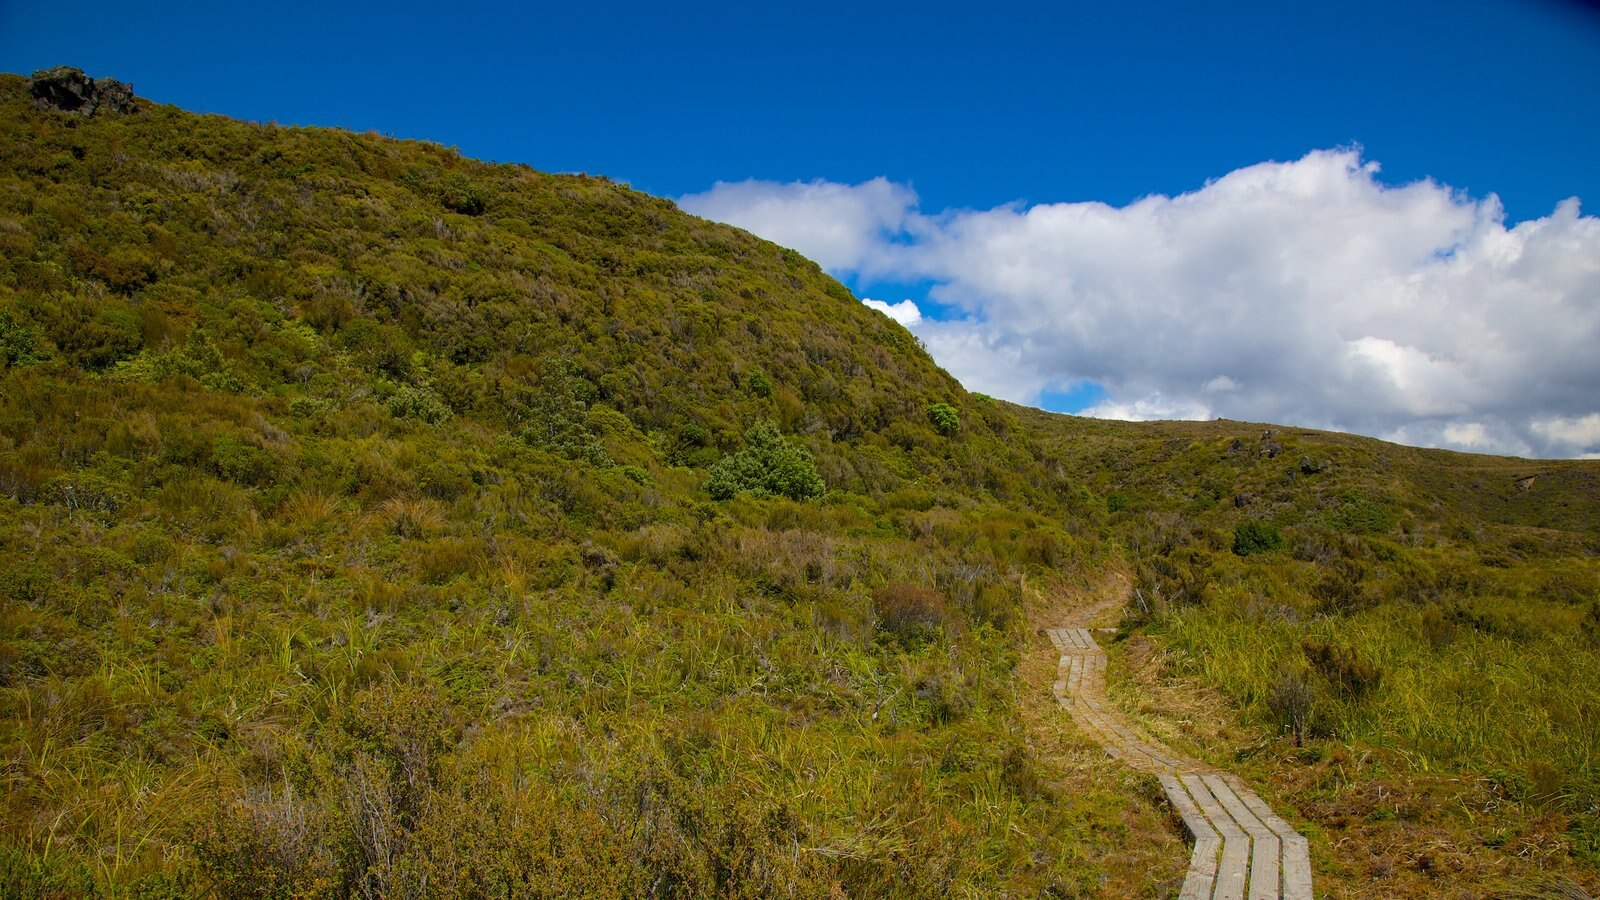 Gardens & Parks Pictures: View Images of Manawatu - Wanganui